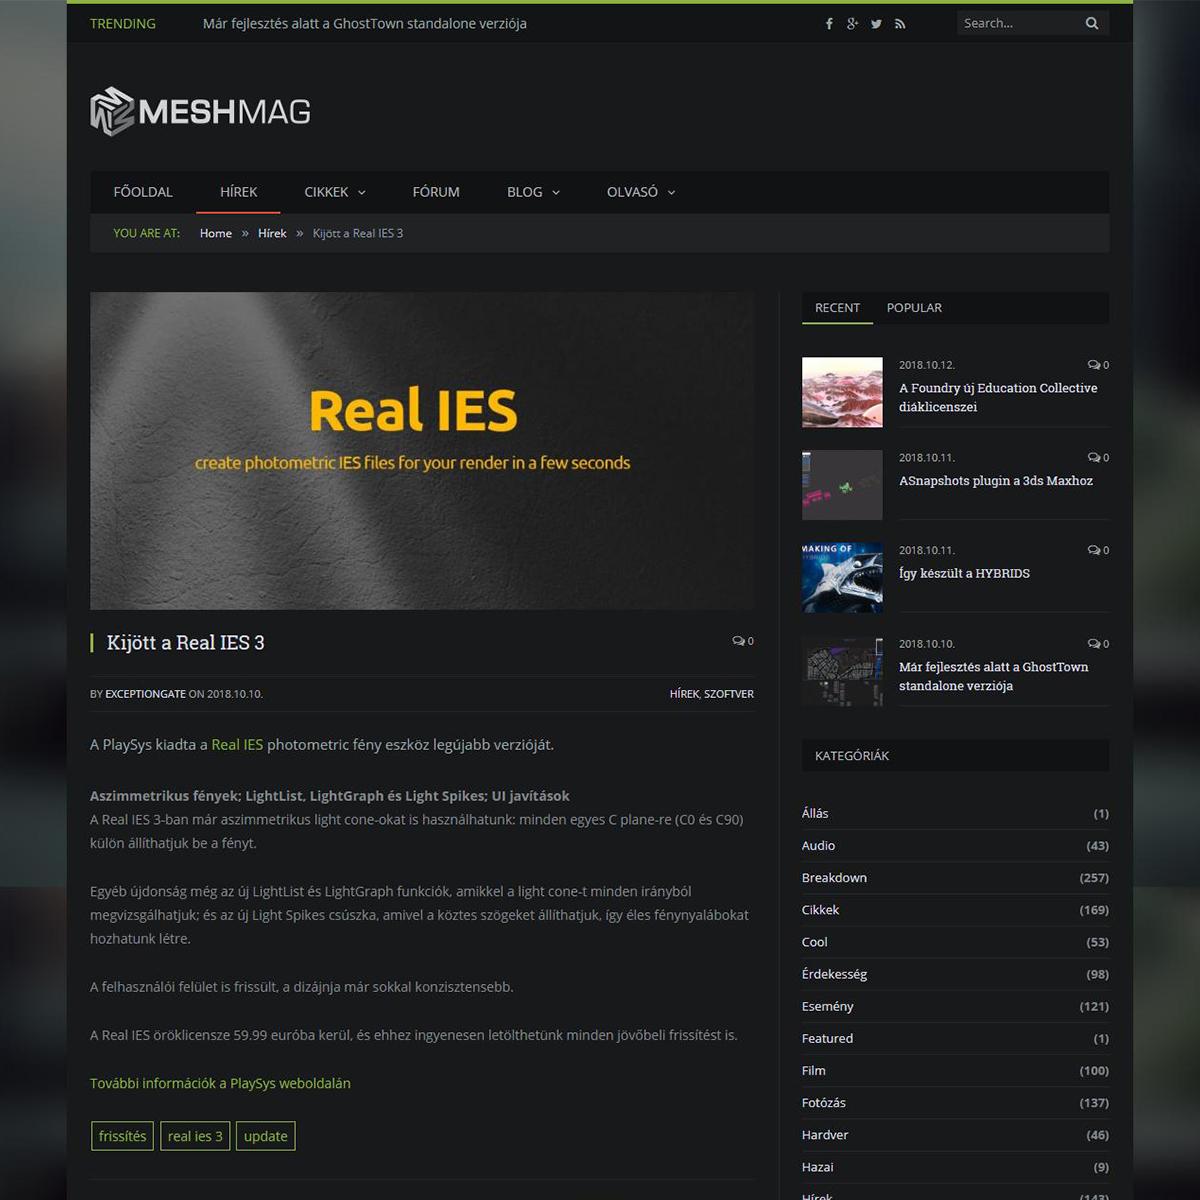 Real IES 3 - Meshmag